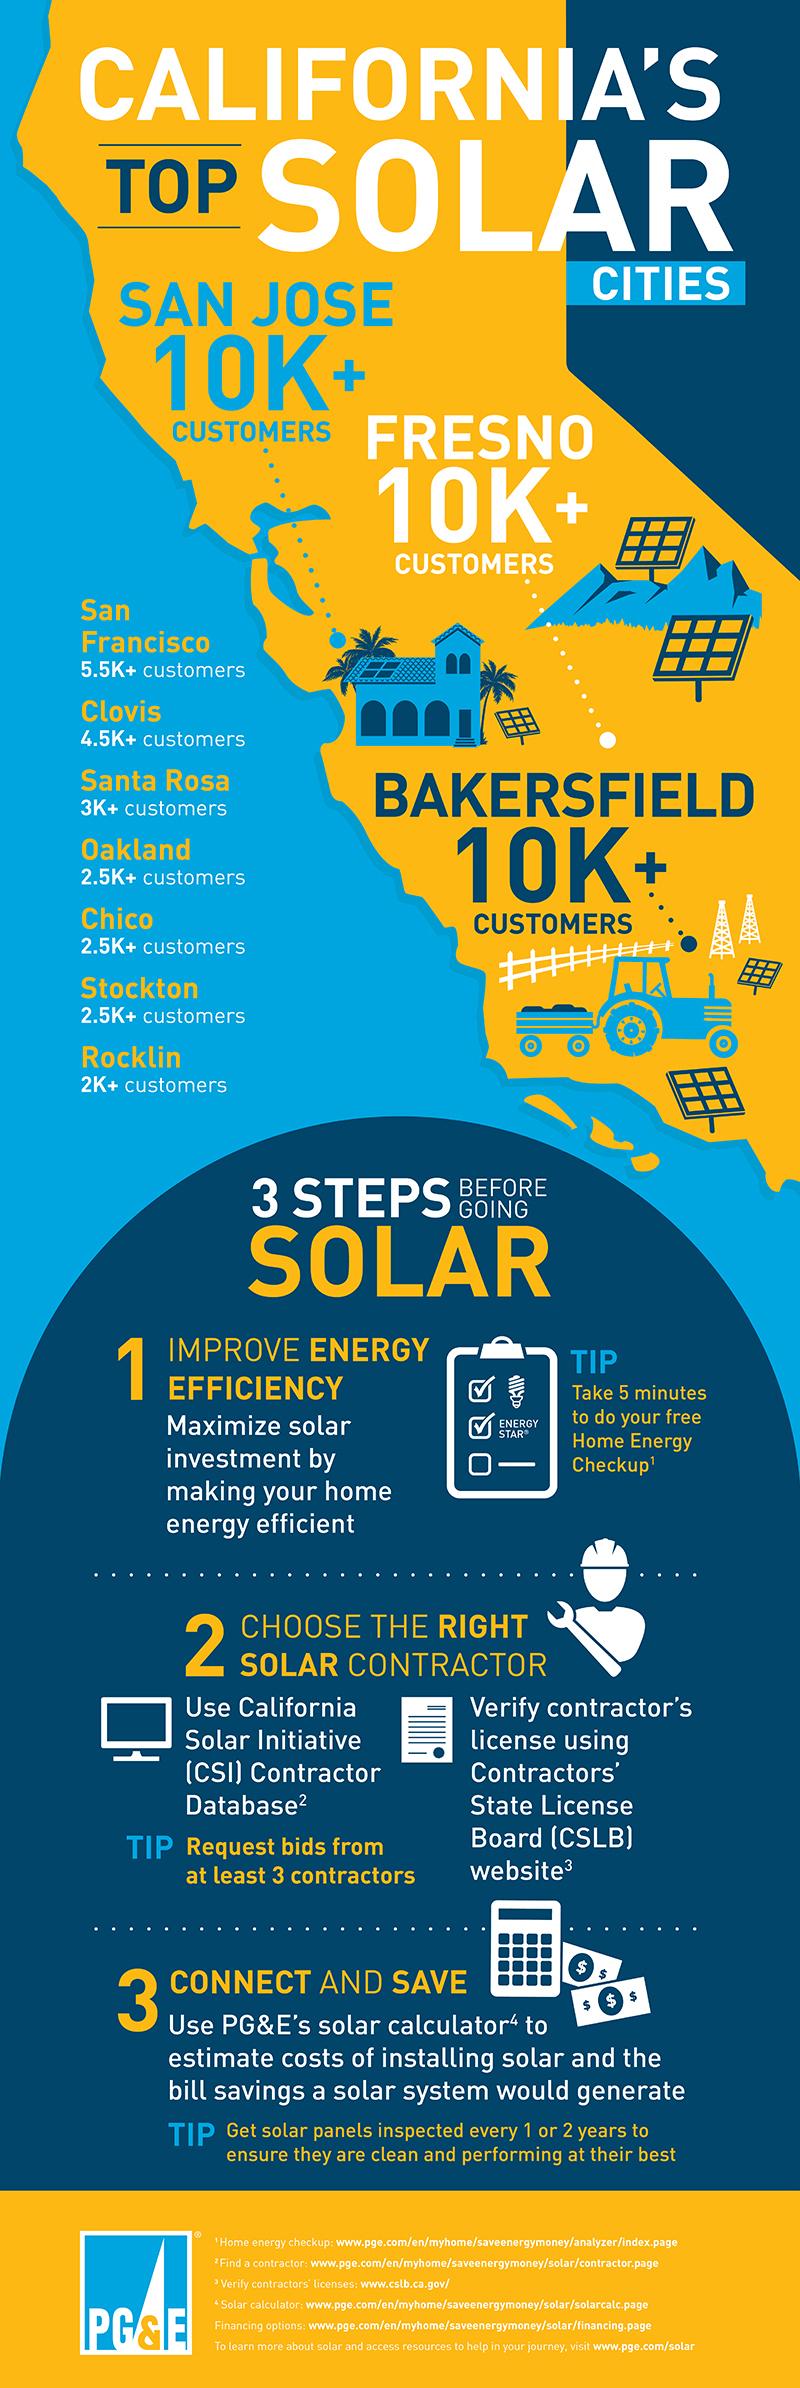 PG&E Surpasses 10,000 Solar Customer Milestones in Bakersfield